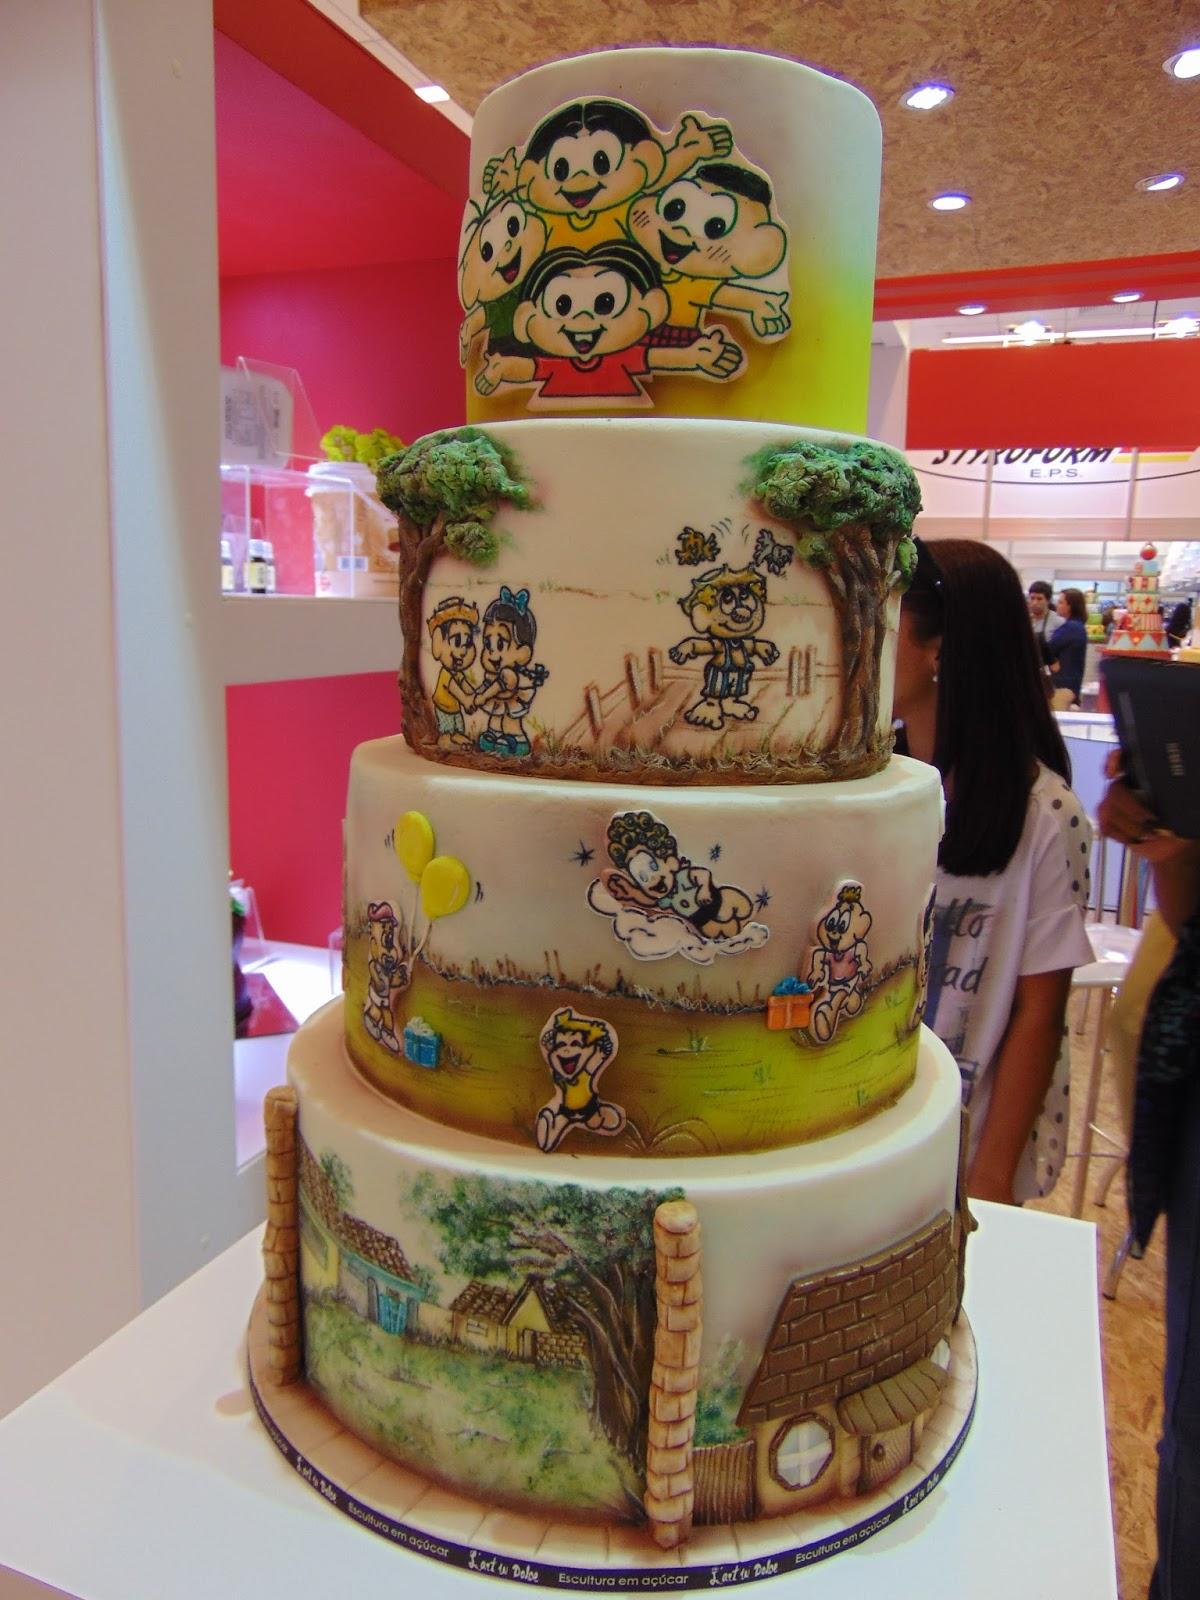 Exposition Cake Design : Raspa do Tacho: Expo Brasil Chocolate e Expo Cake Design ...